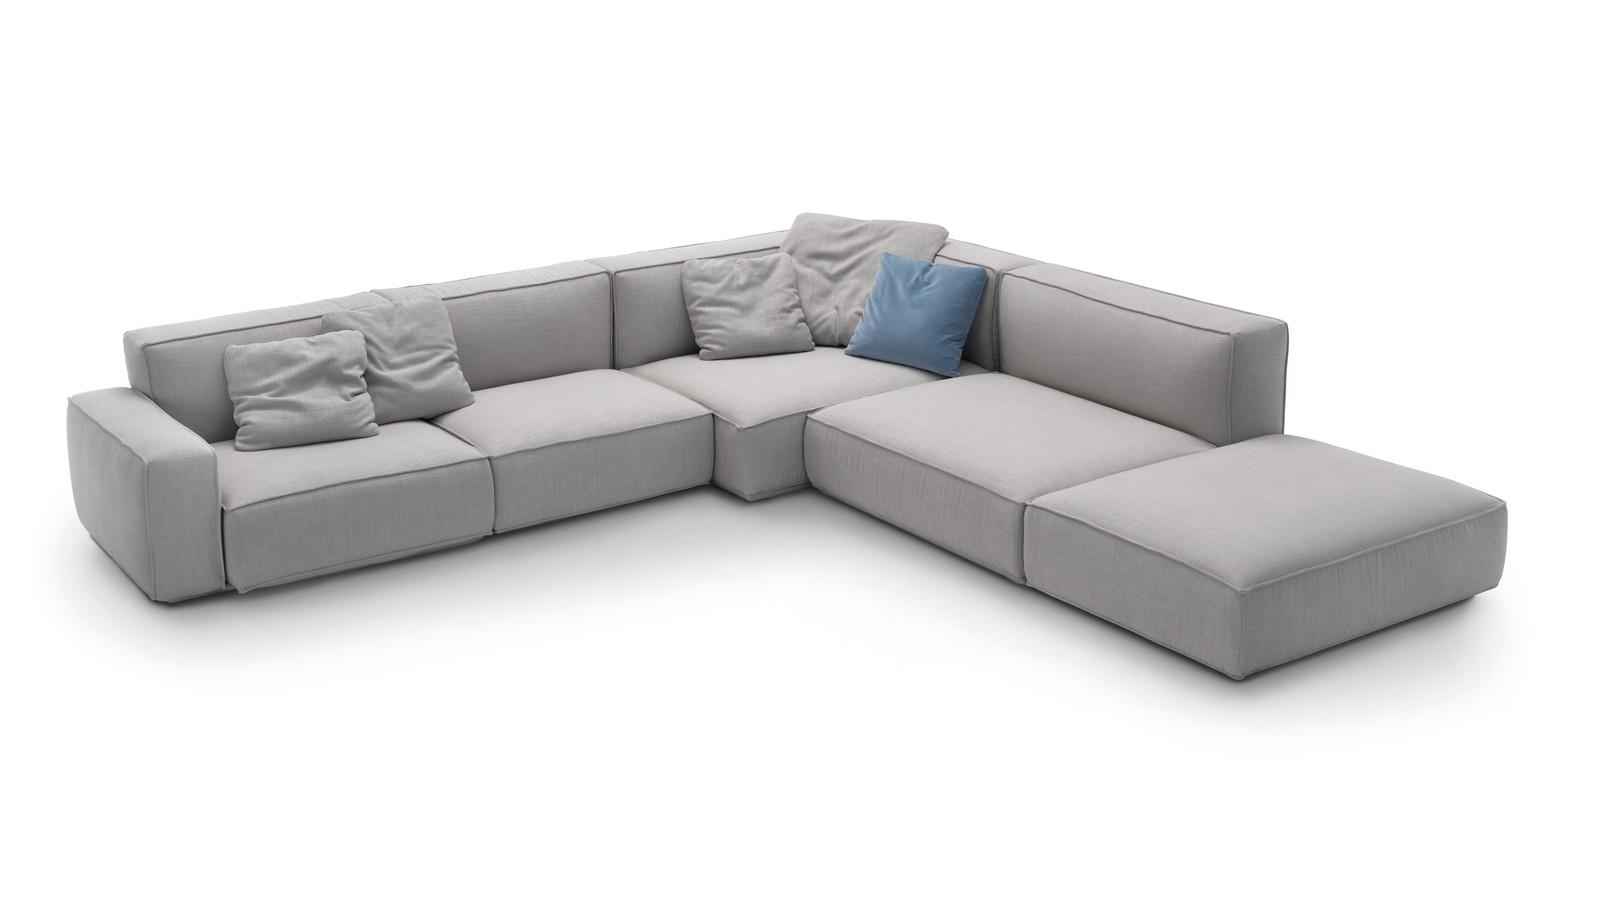 TinnappelMetz-arflex-Marechiaro-sofa-08